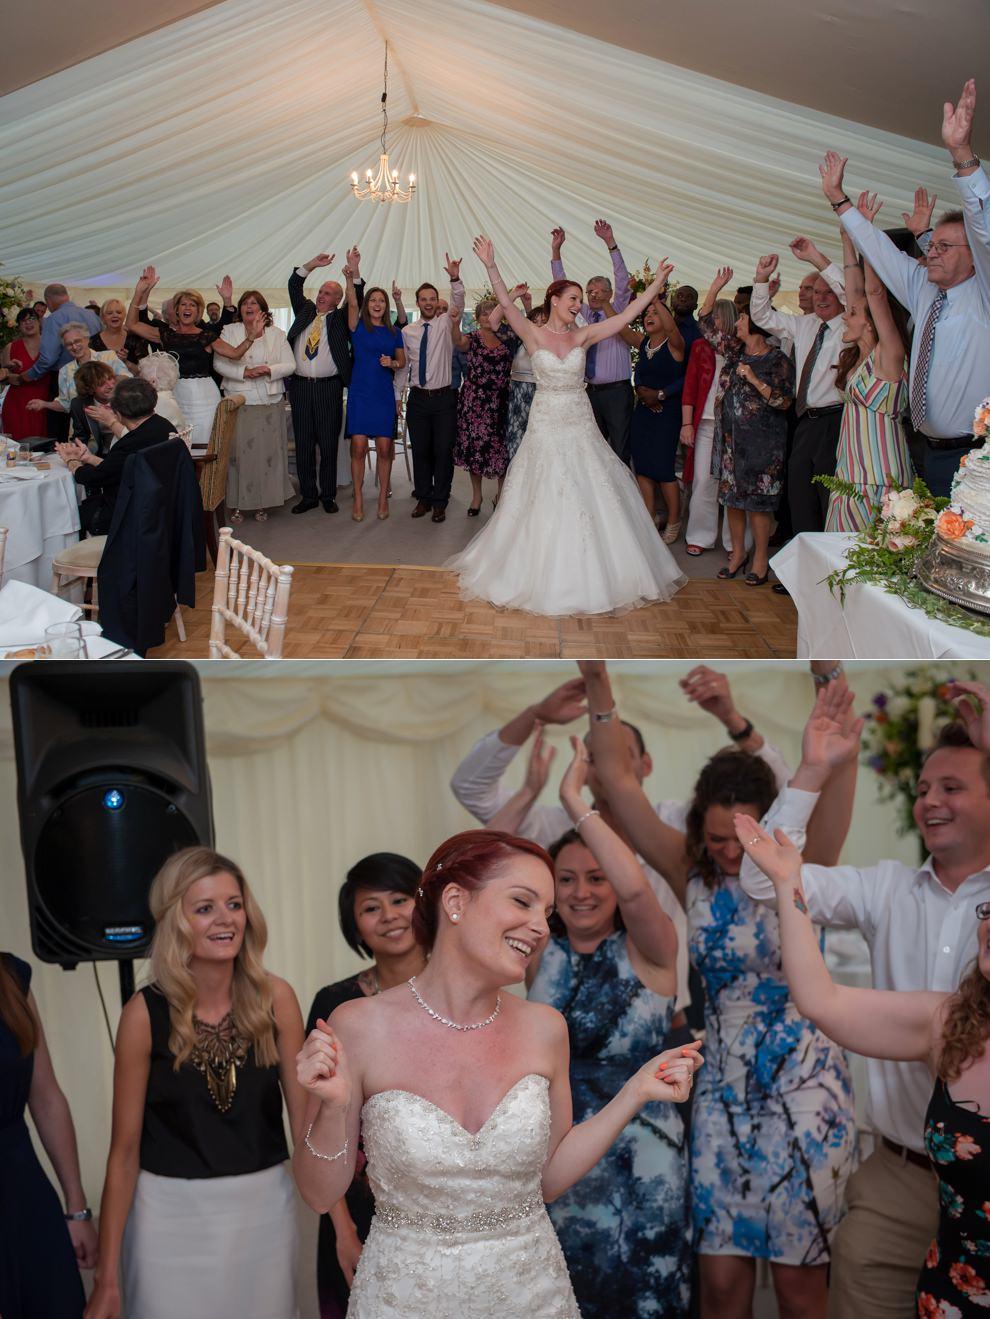 Debi Paul Wedding Photographer Hertfordshire (36)